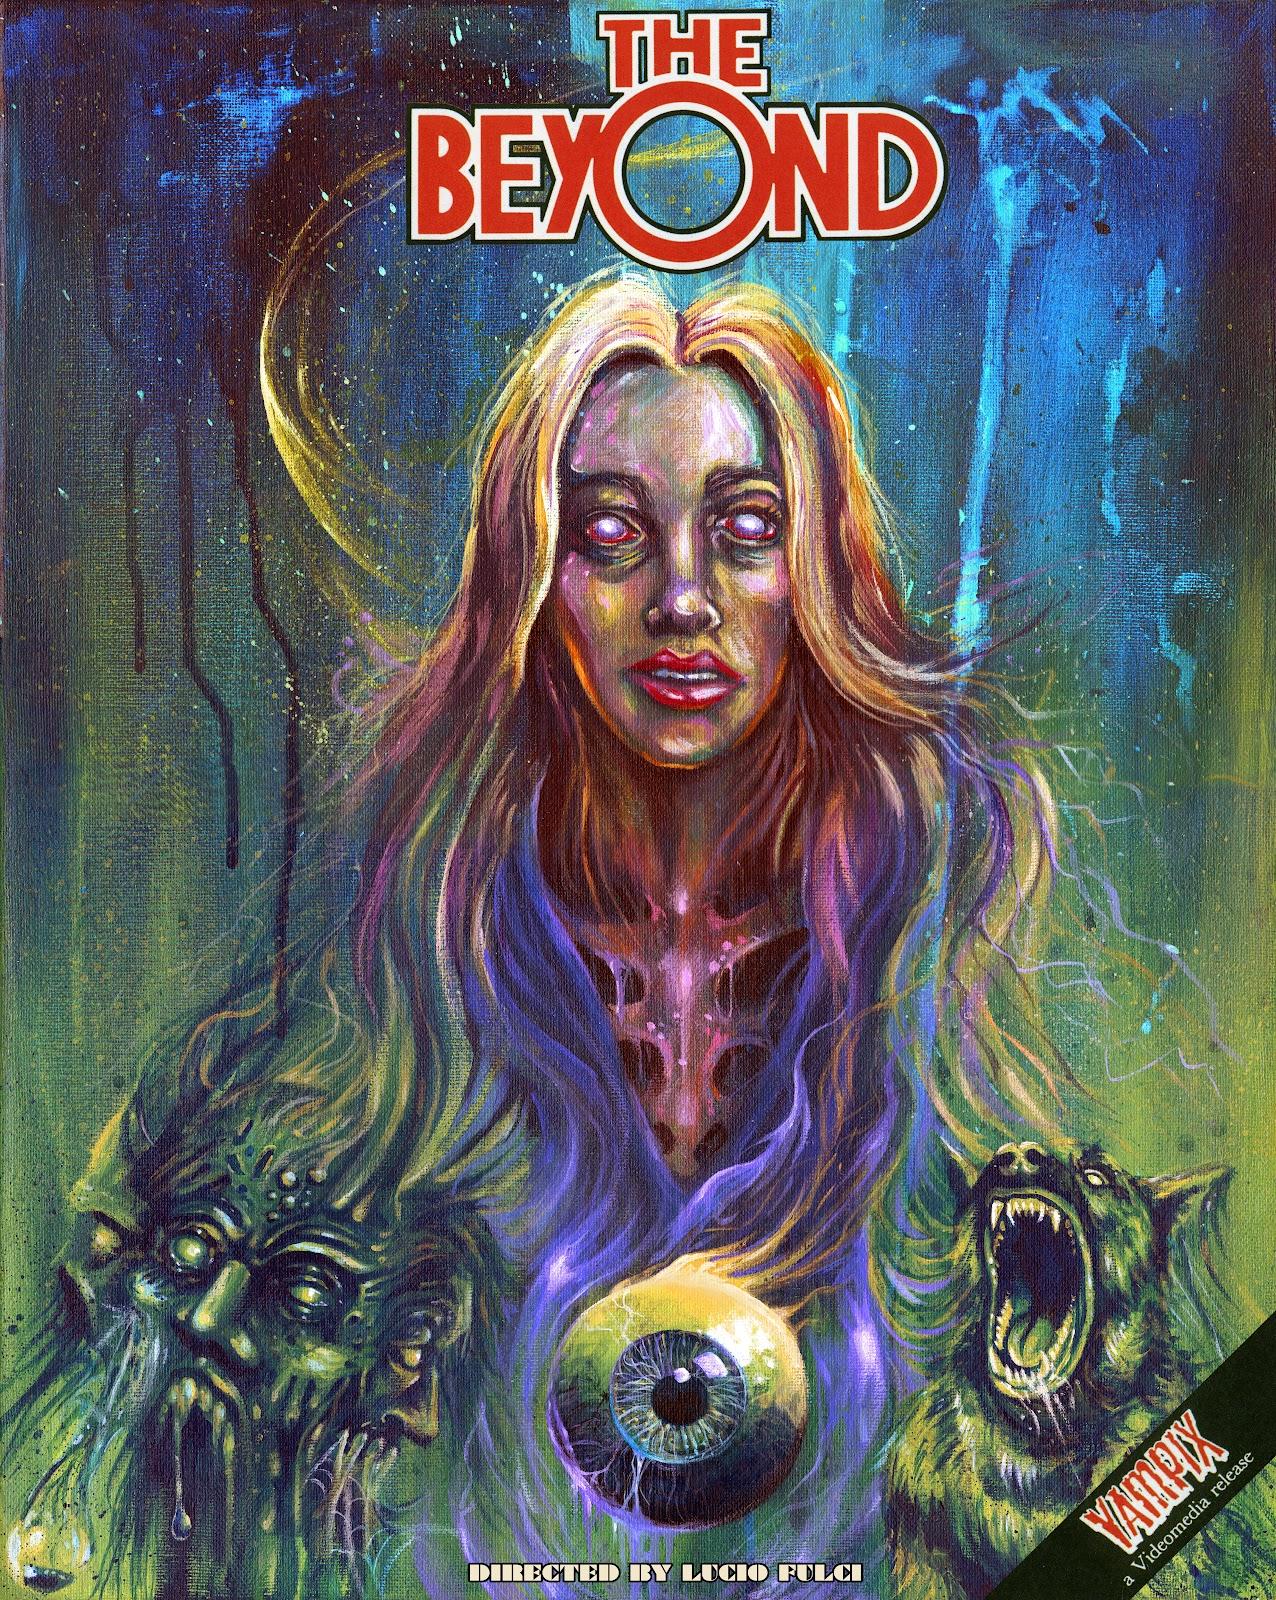 Beyond Film